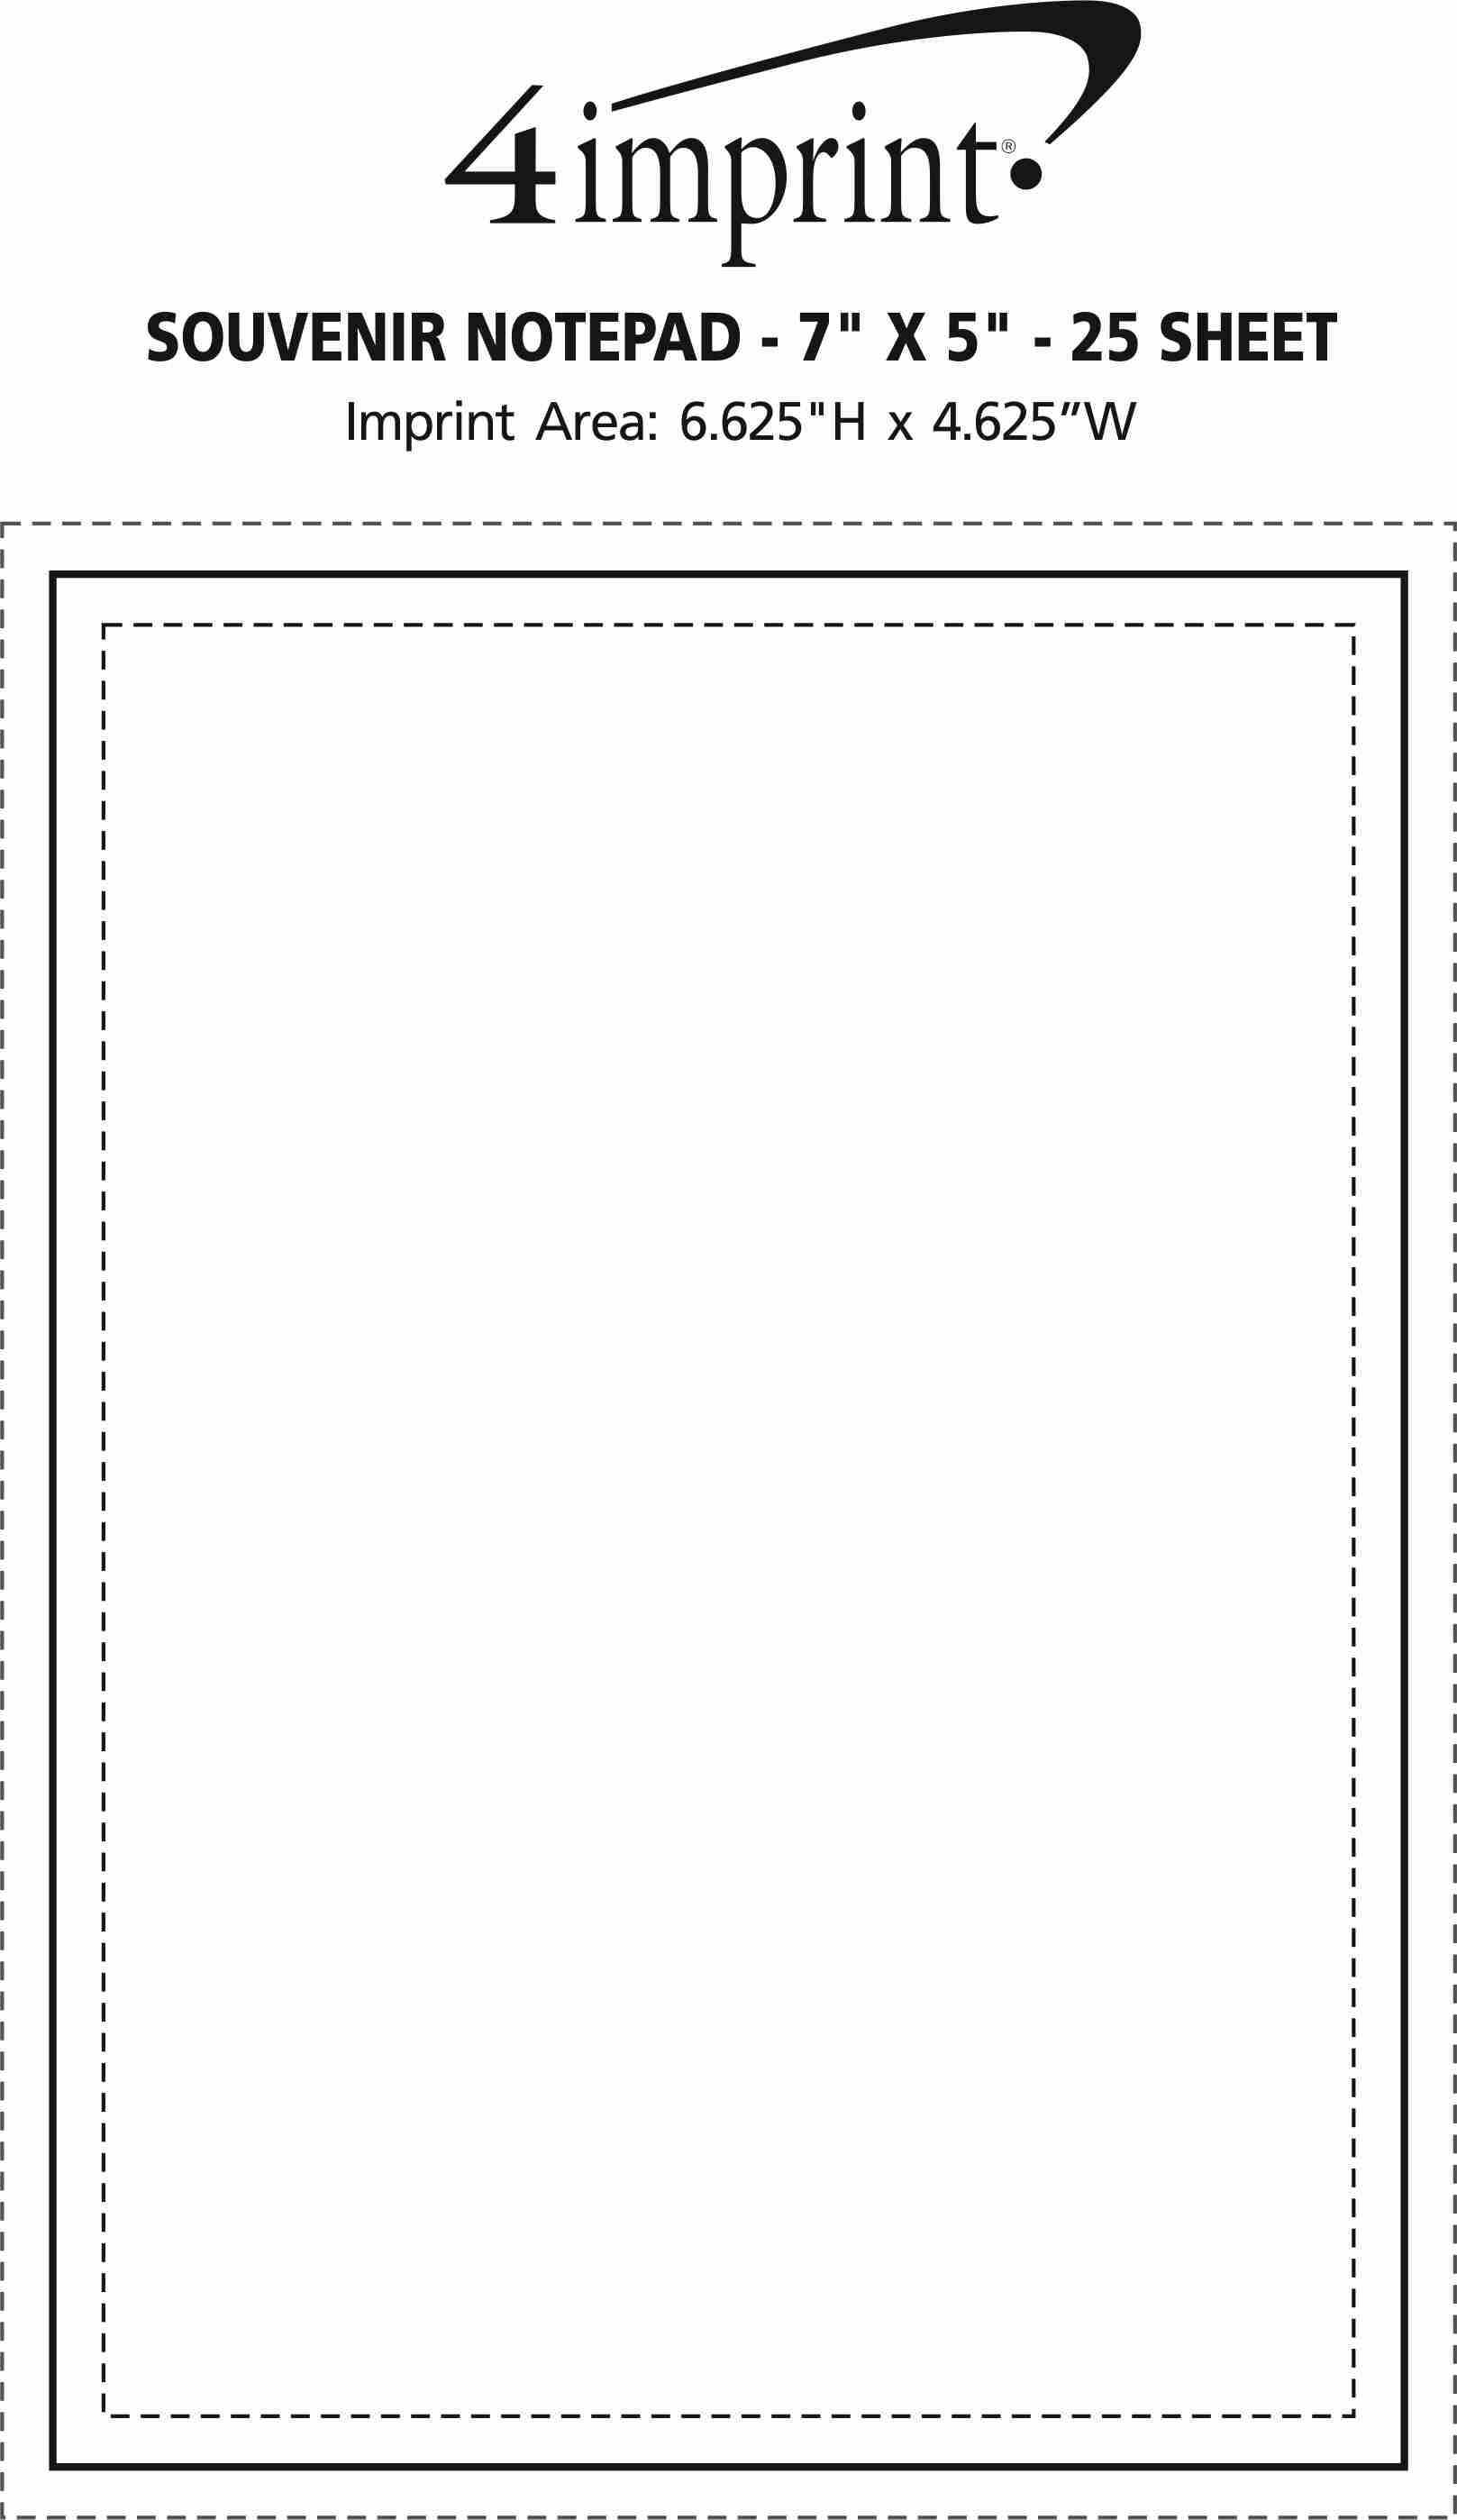 "Imprint Area of Bic Non-Adhesive Notepad - 7"" x 5"" - 25 Sheet"